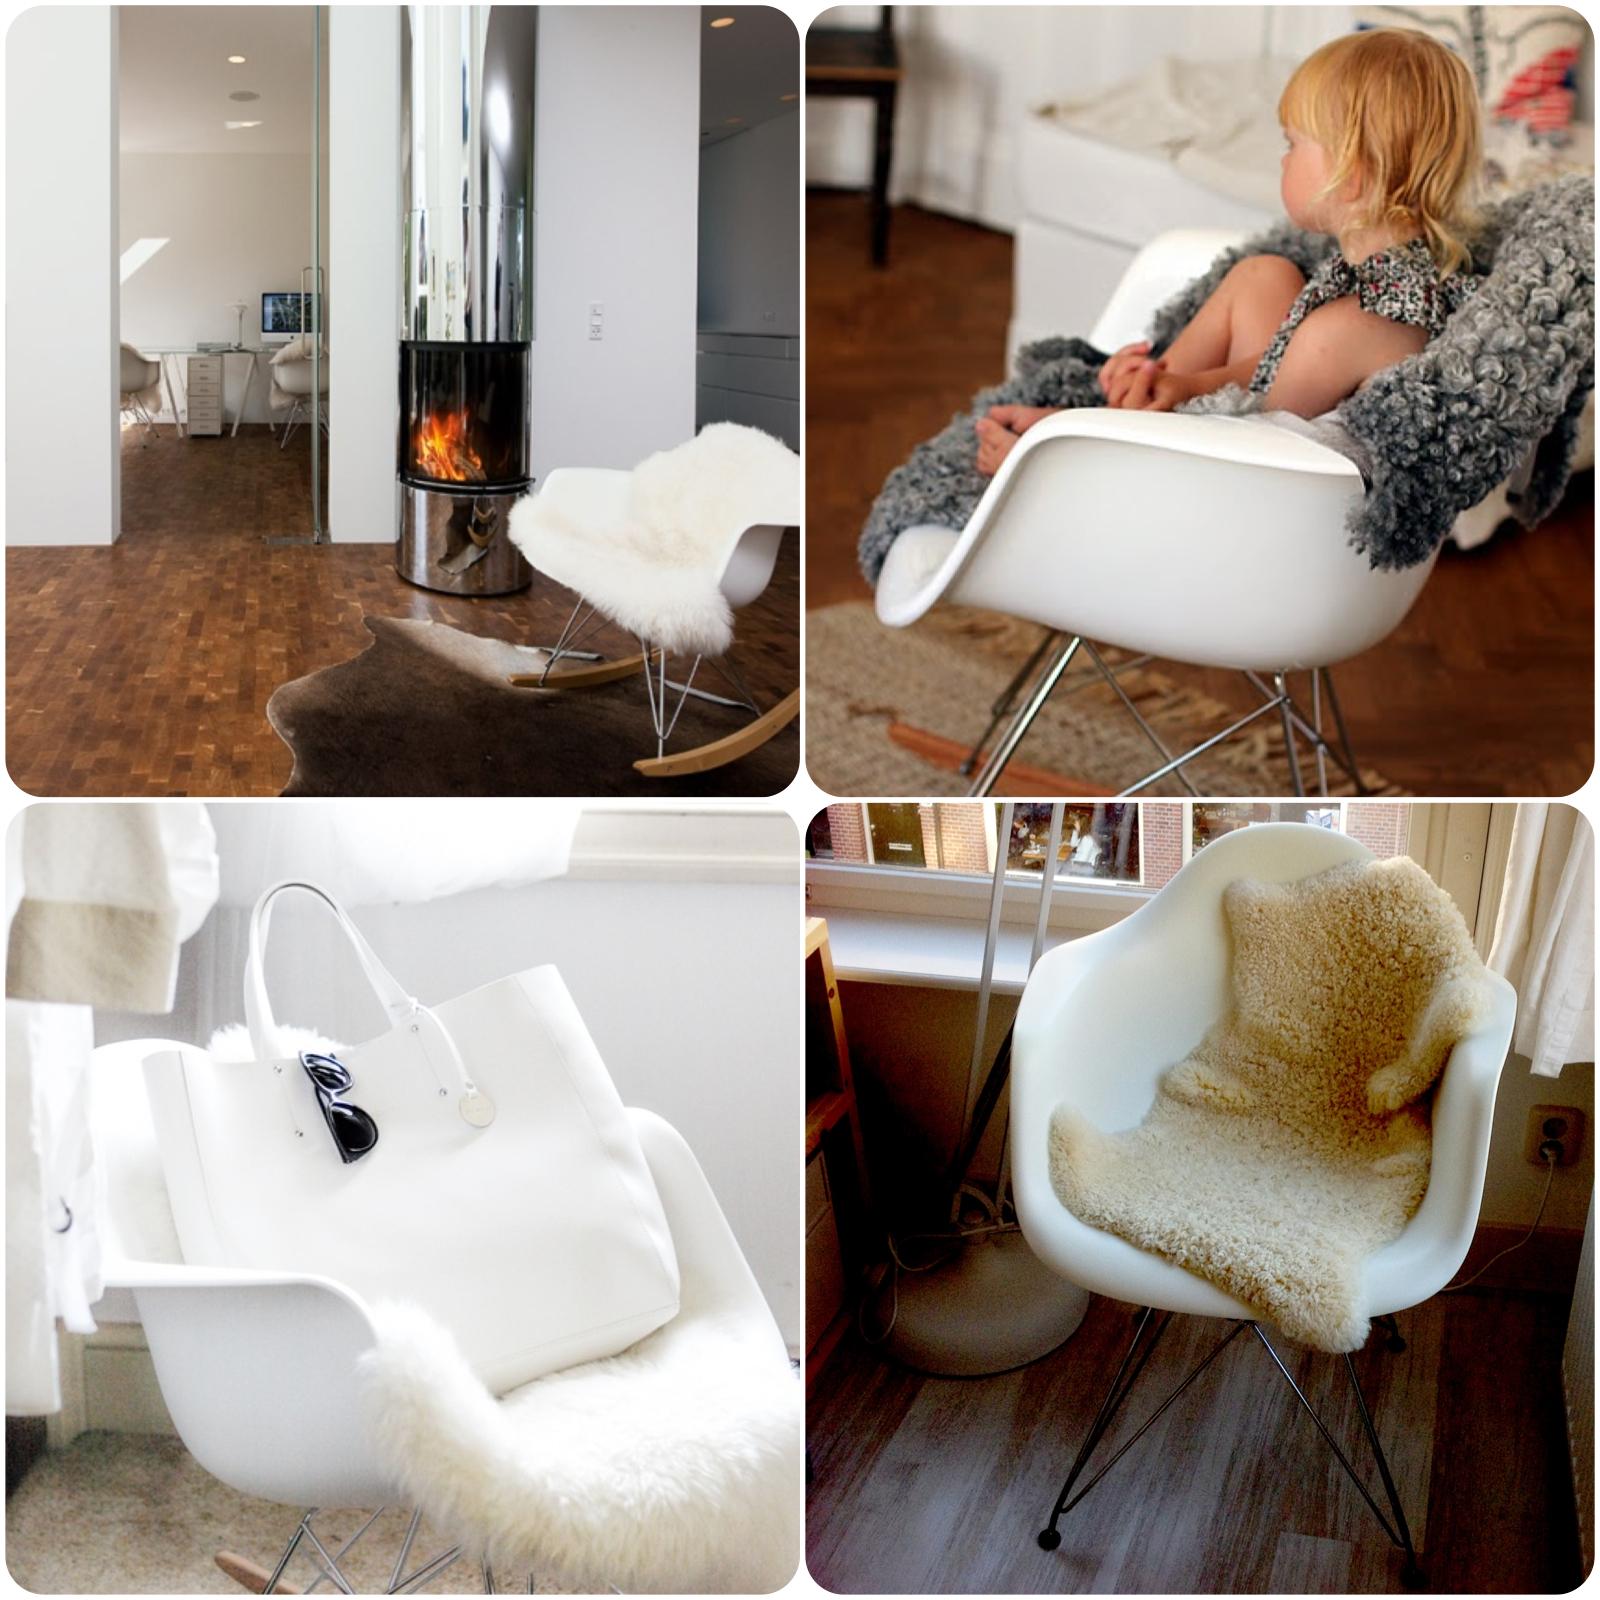 Tappeti Pelle Ikea: Oltre idee su tappeto di pelle pecora tappeti.